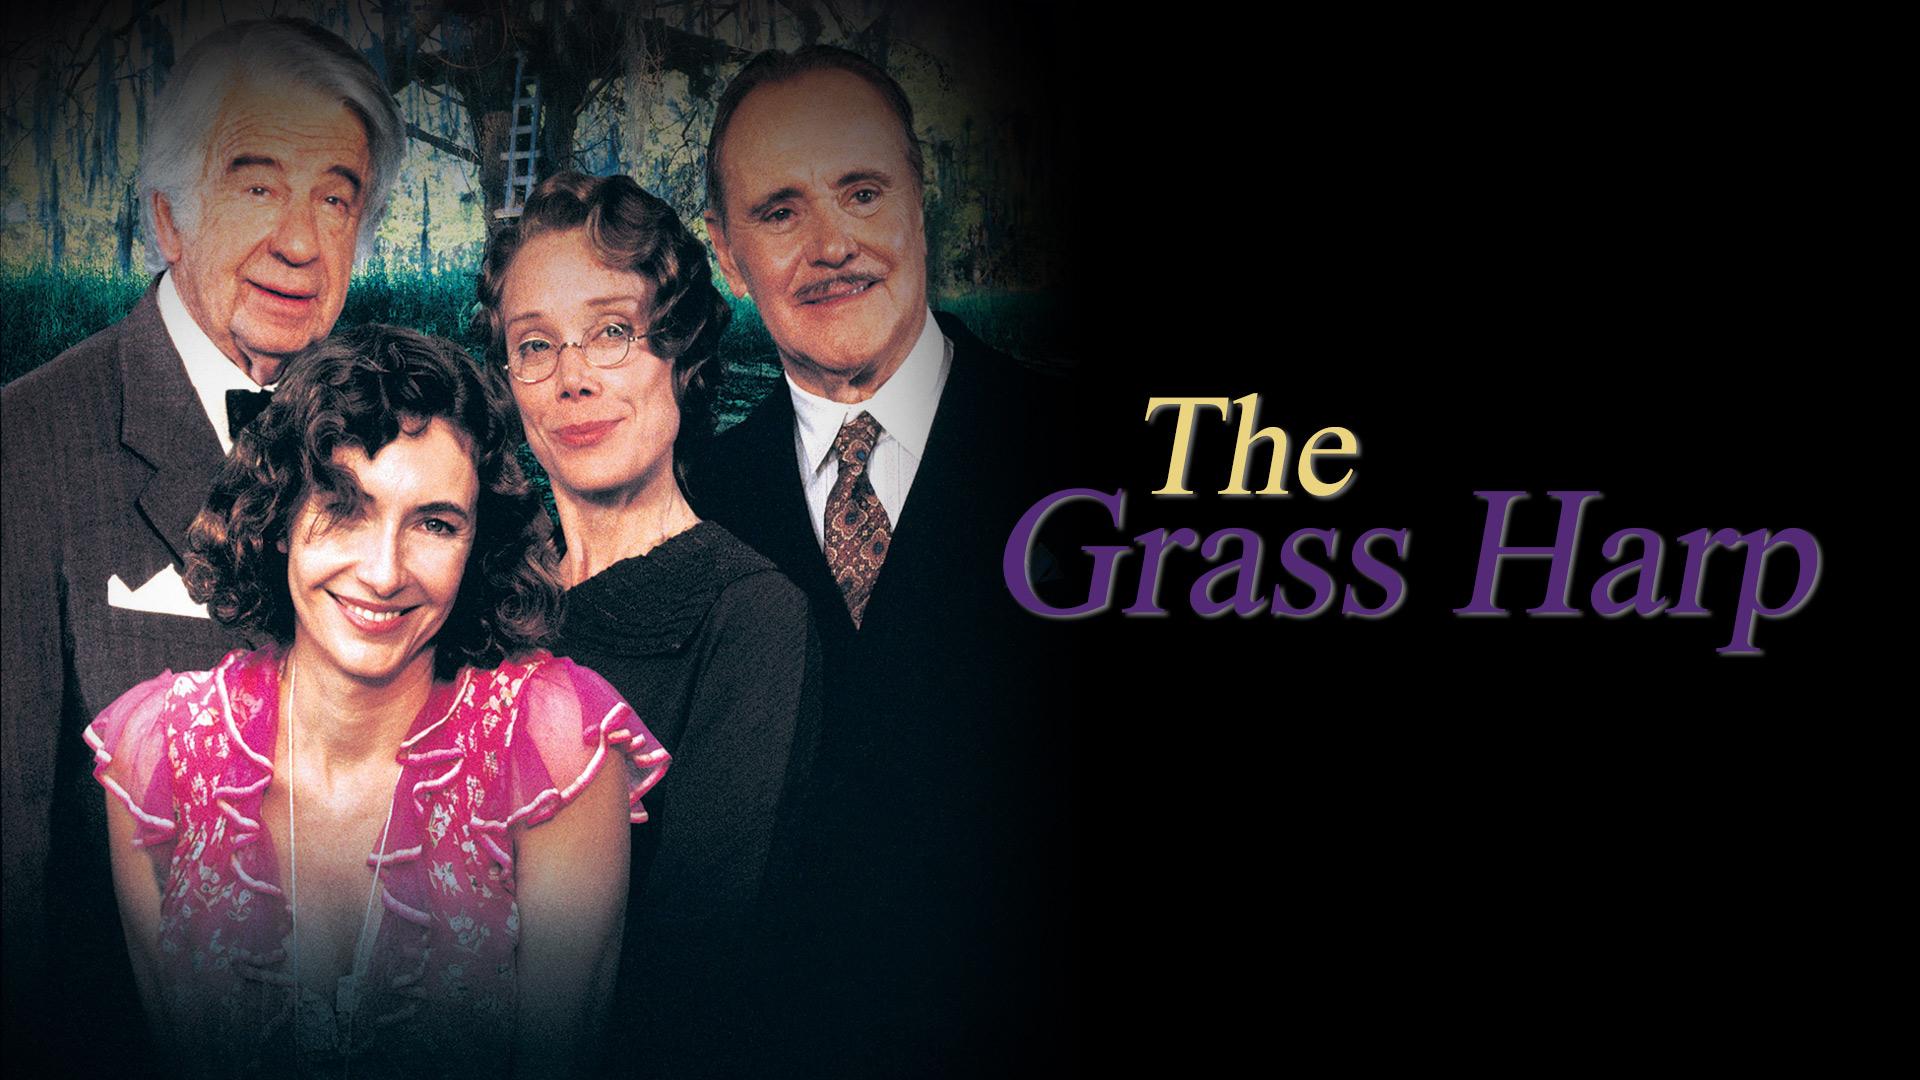 The Grass Harp (1996)